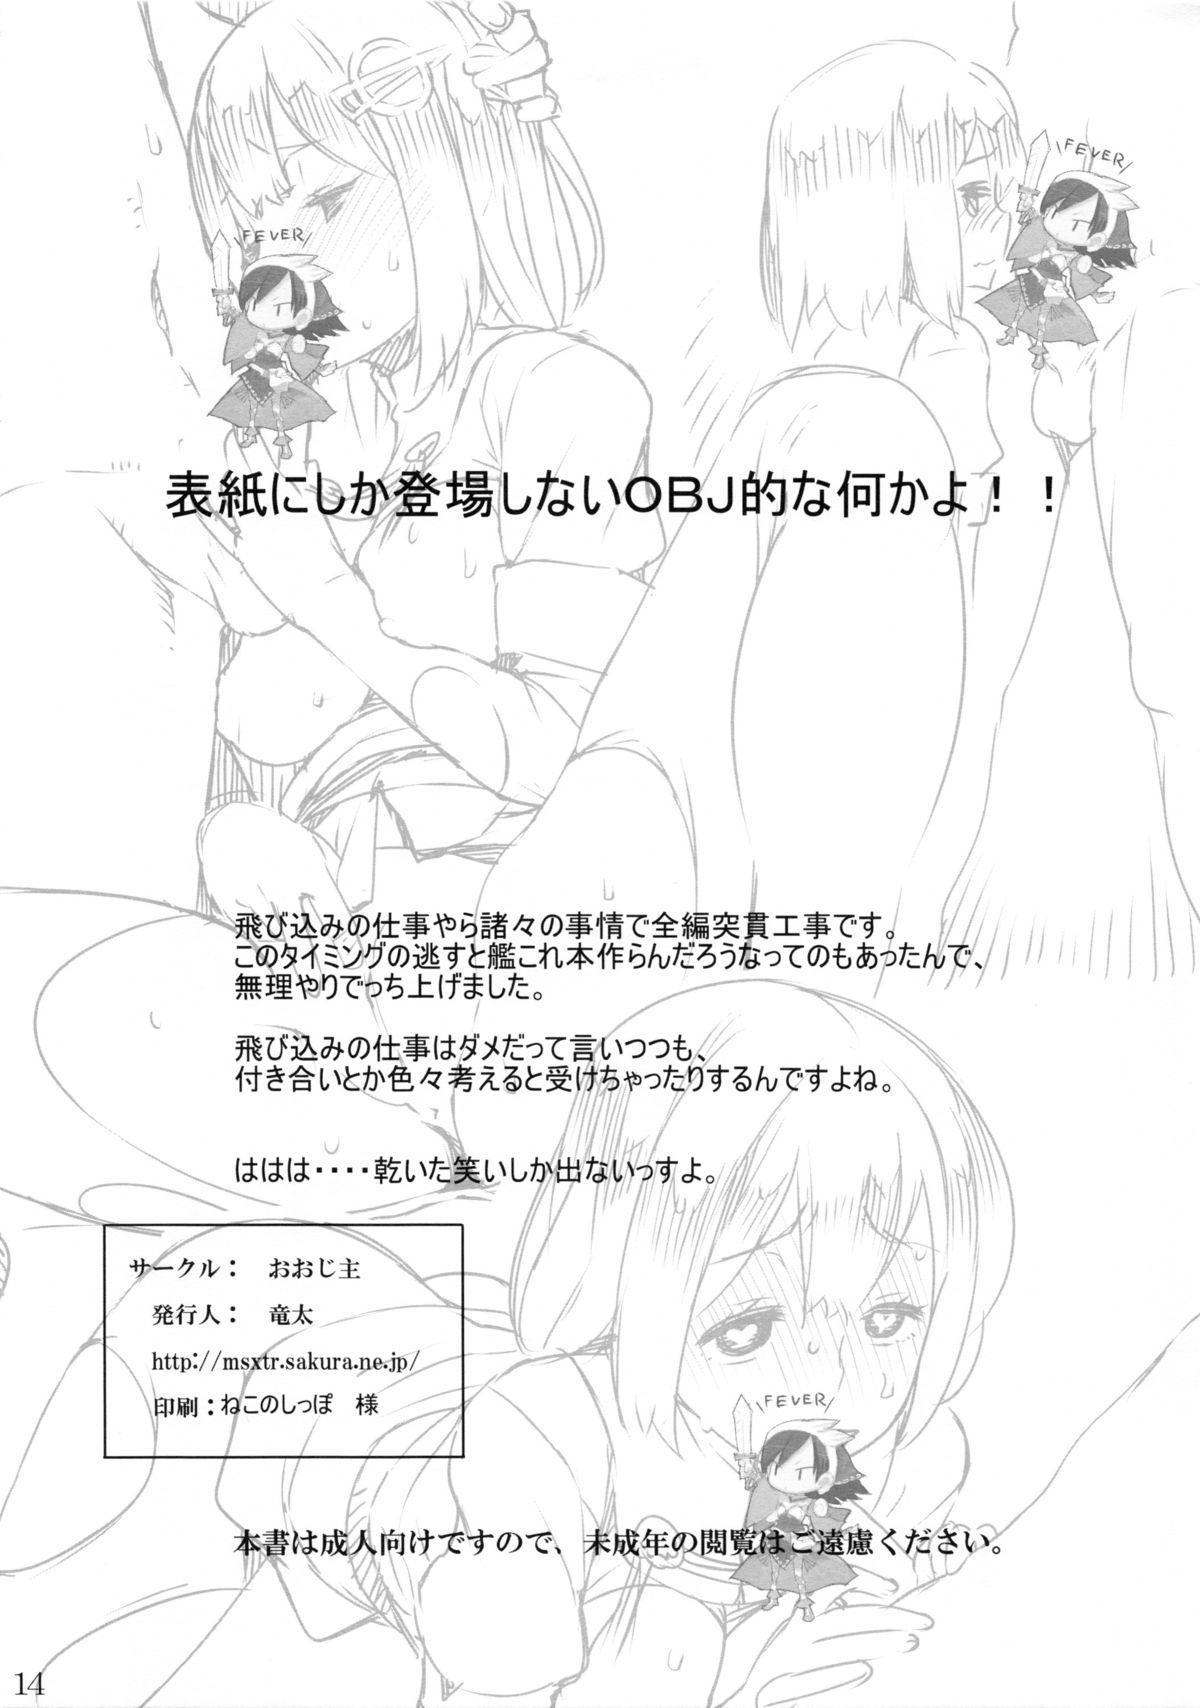 Senjou no Ookami 12